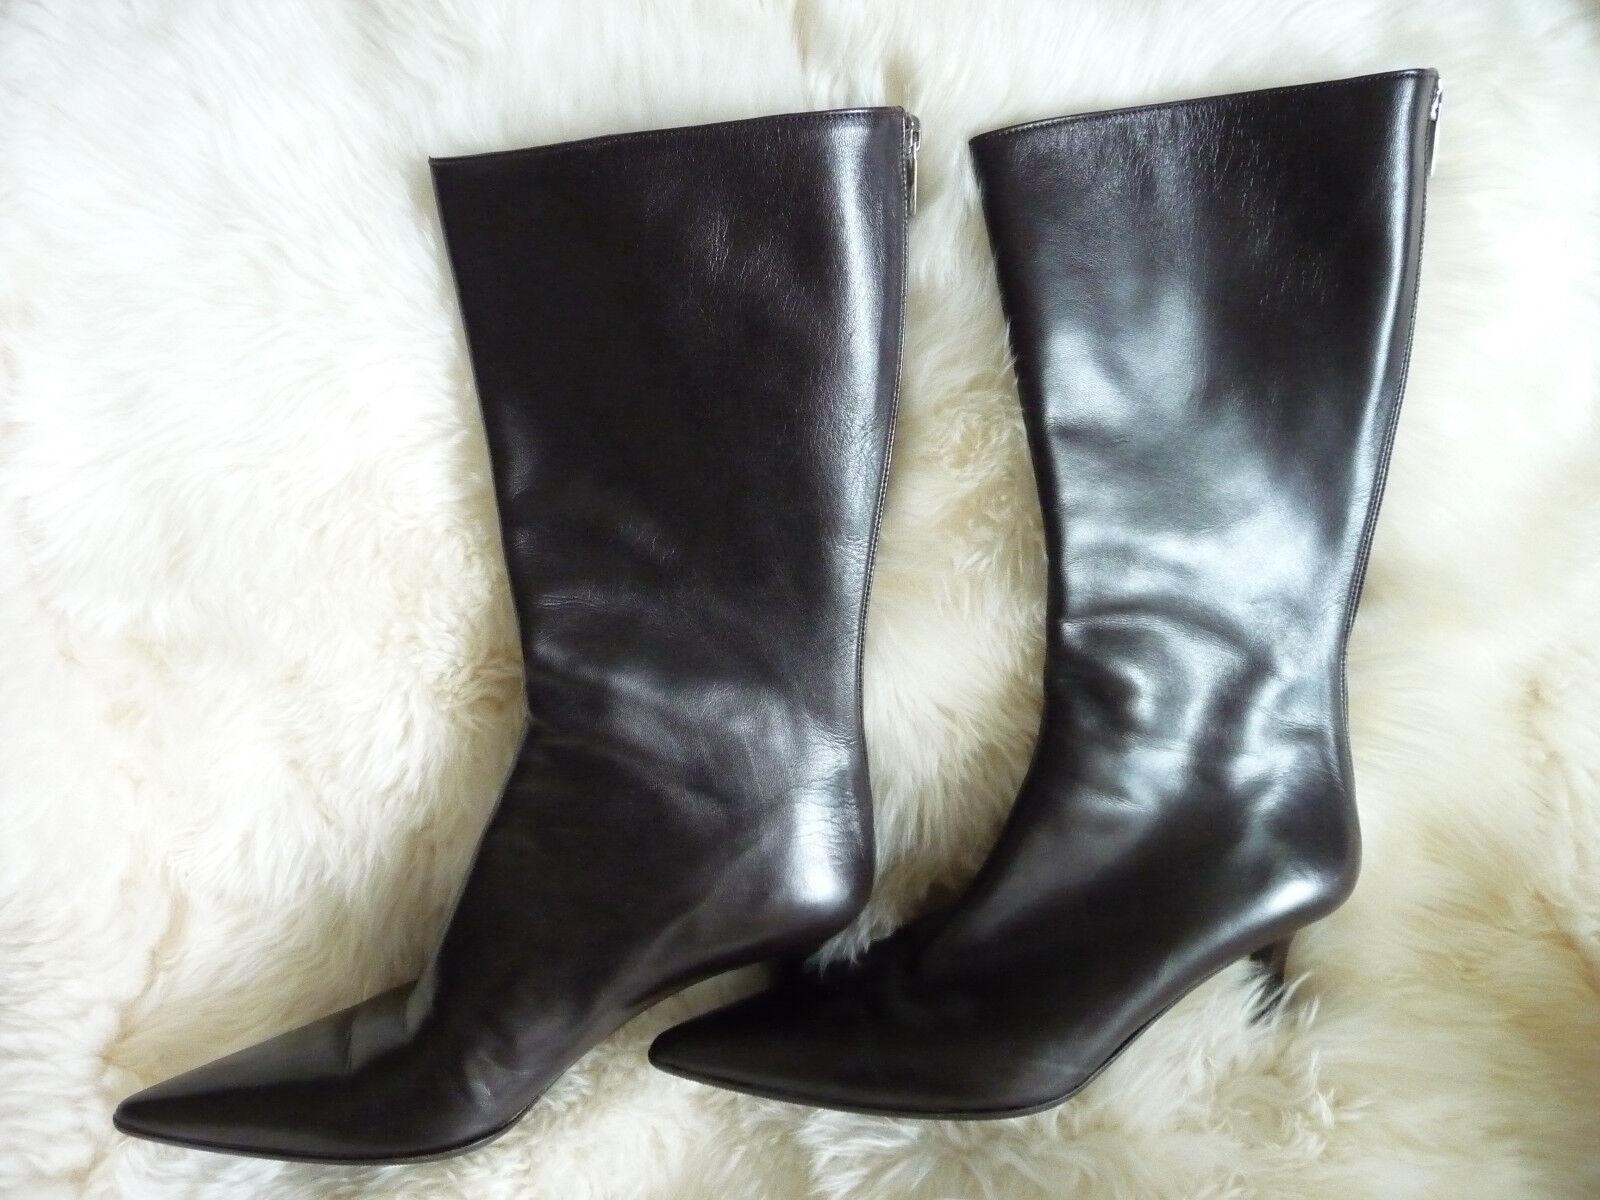 I. Cavallini All Leather Midrise Boots